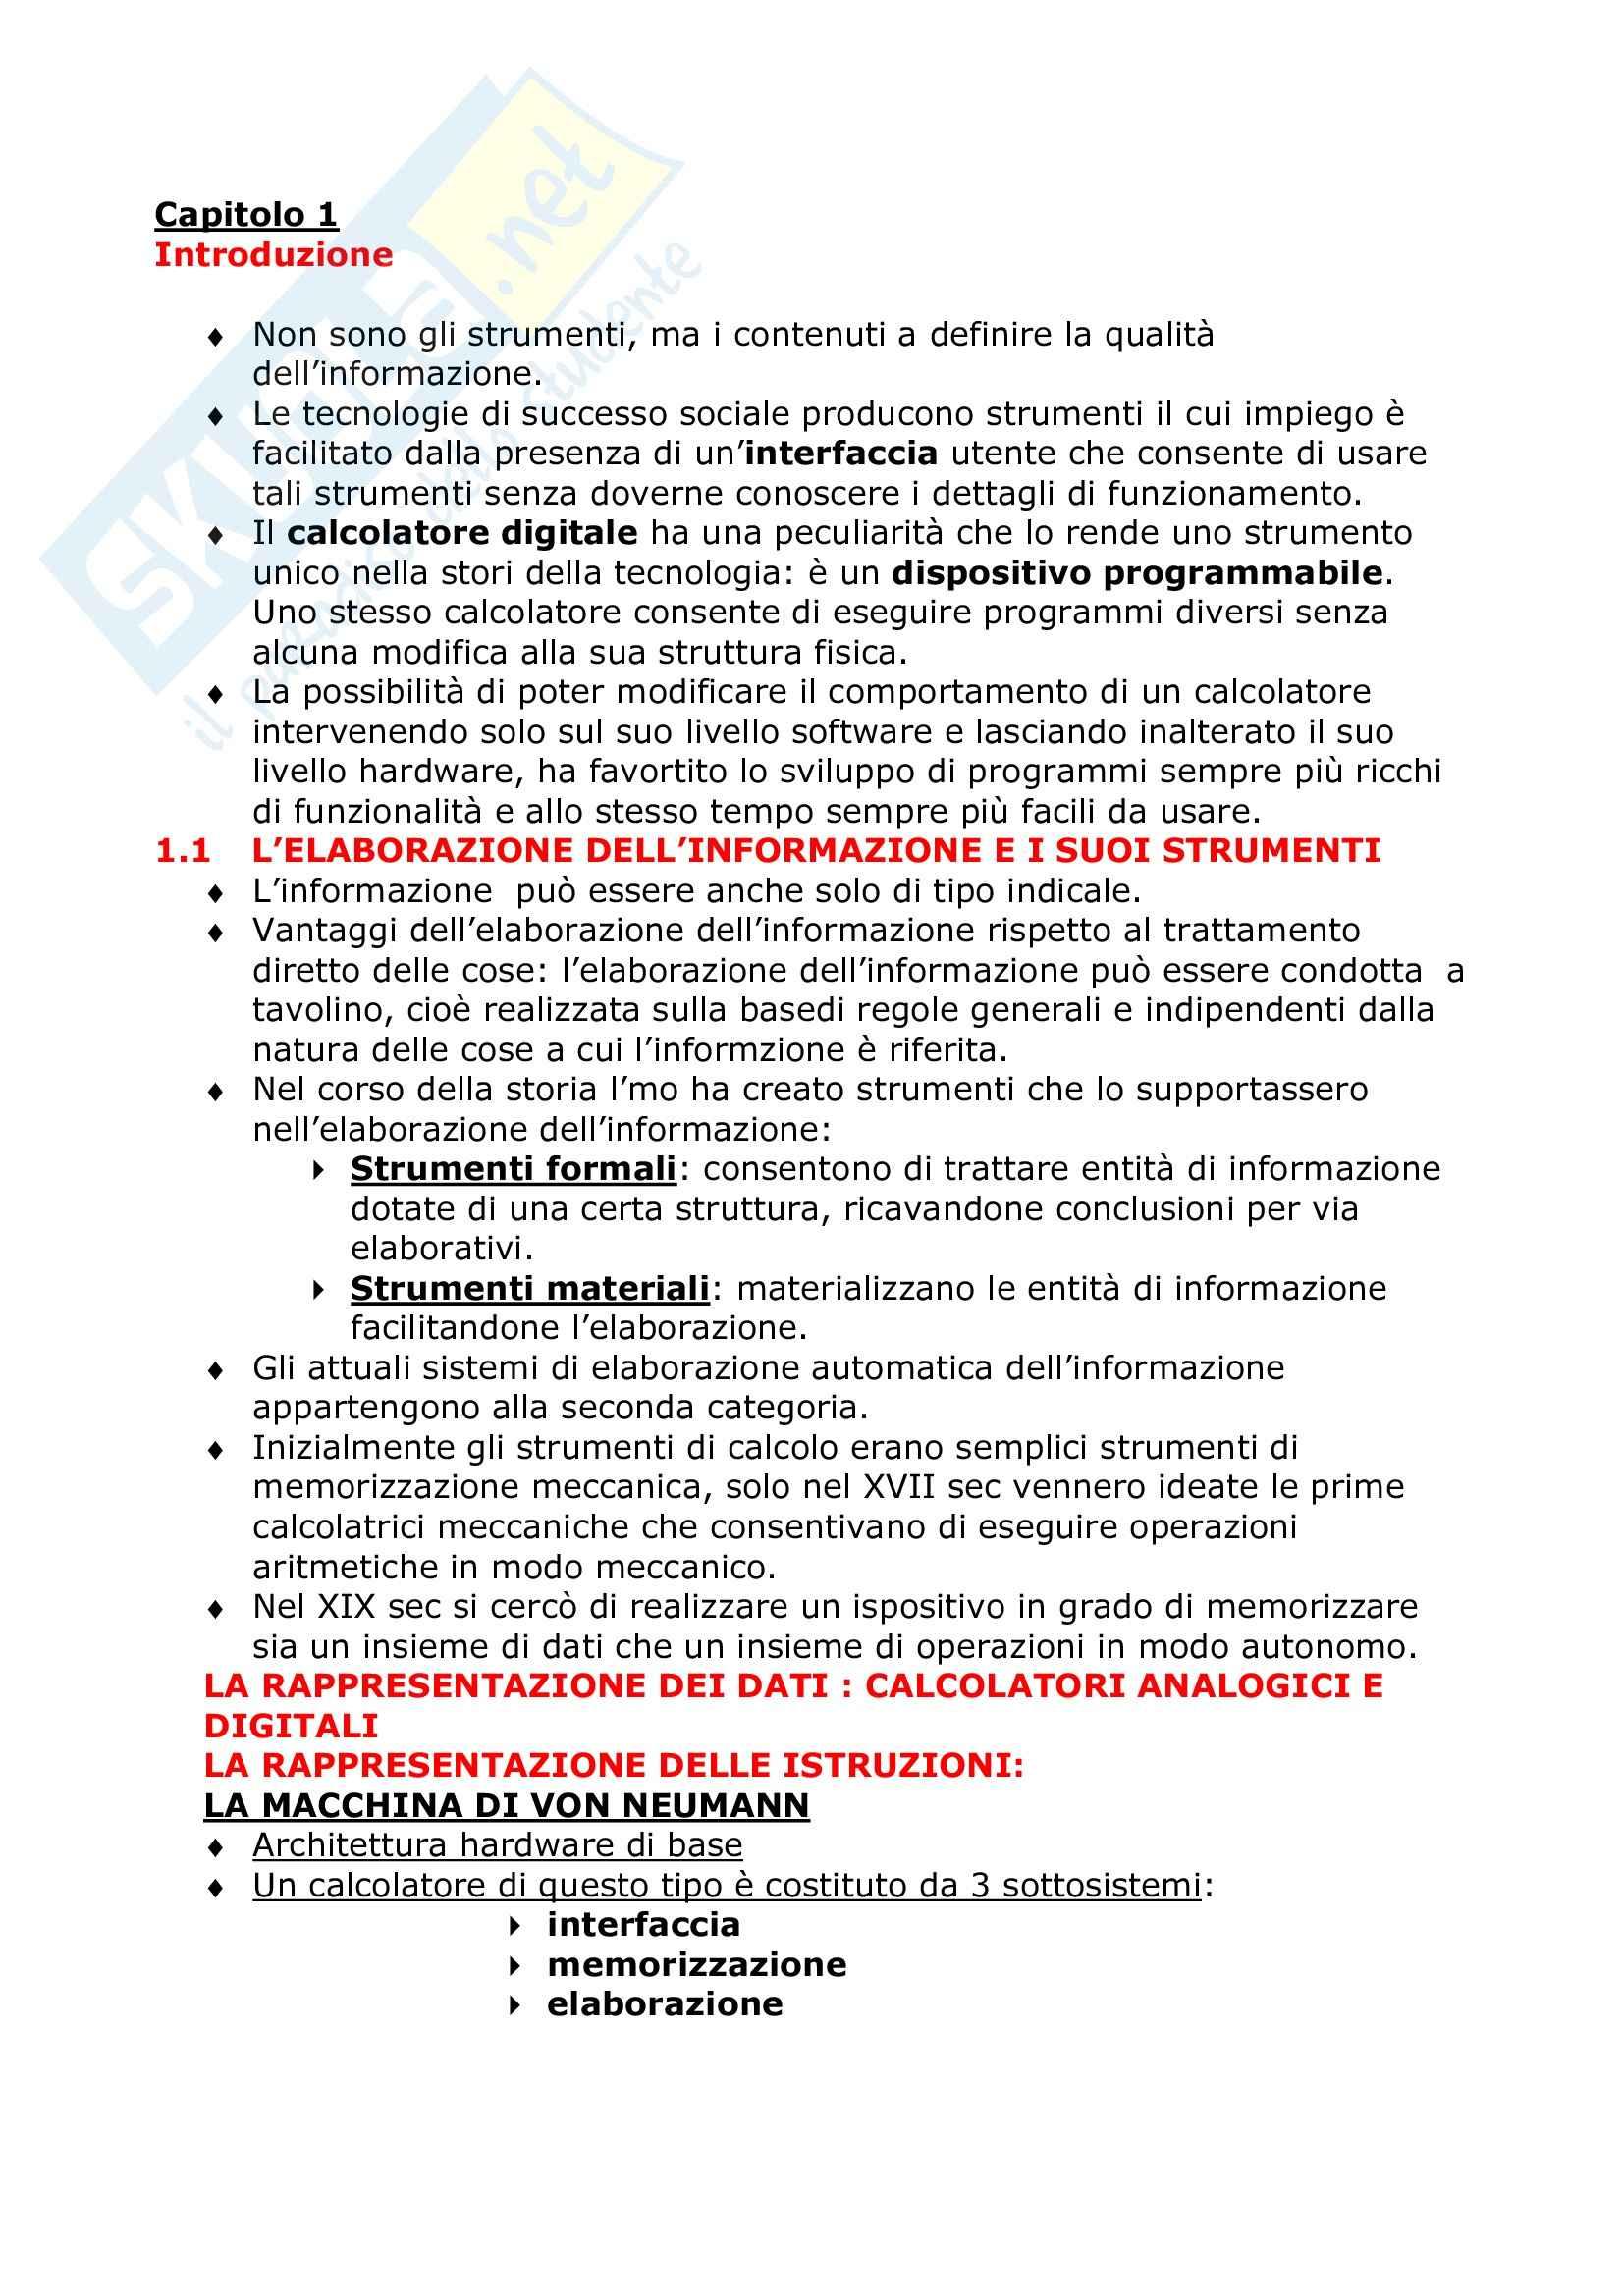 Informatica generale - Riassunto esame, prof. Moro